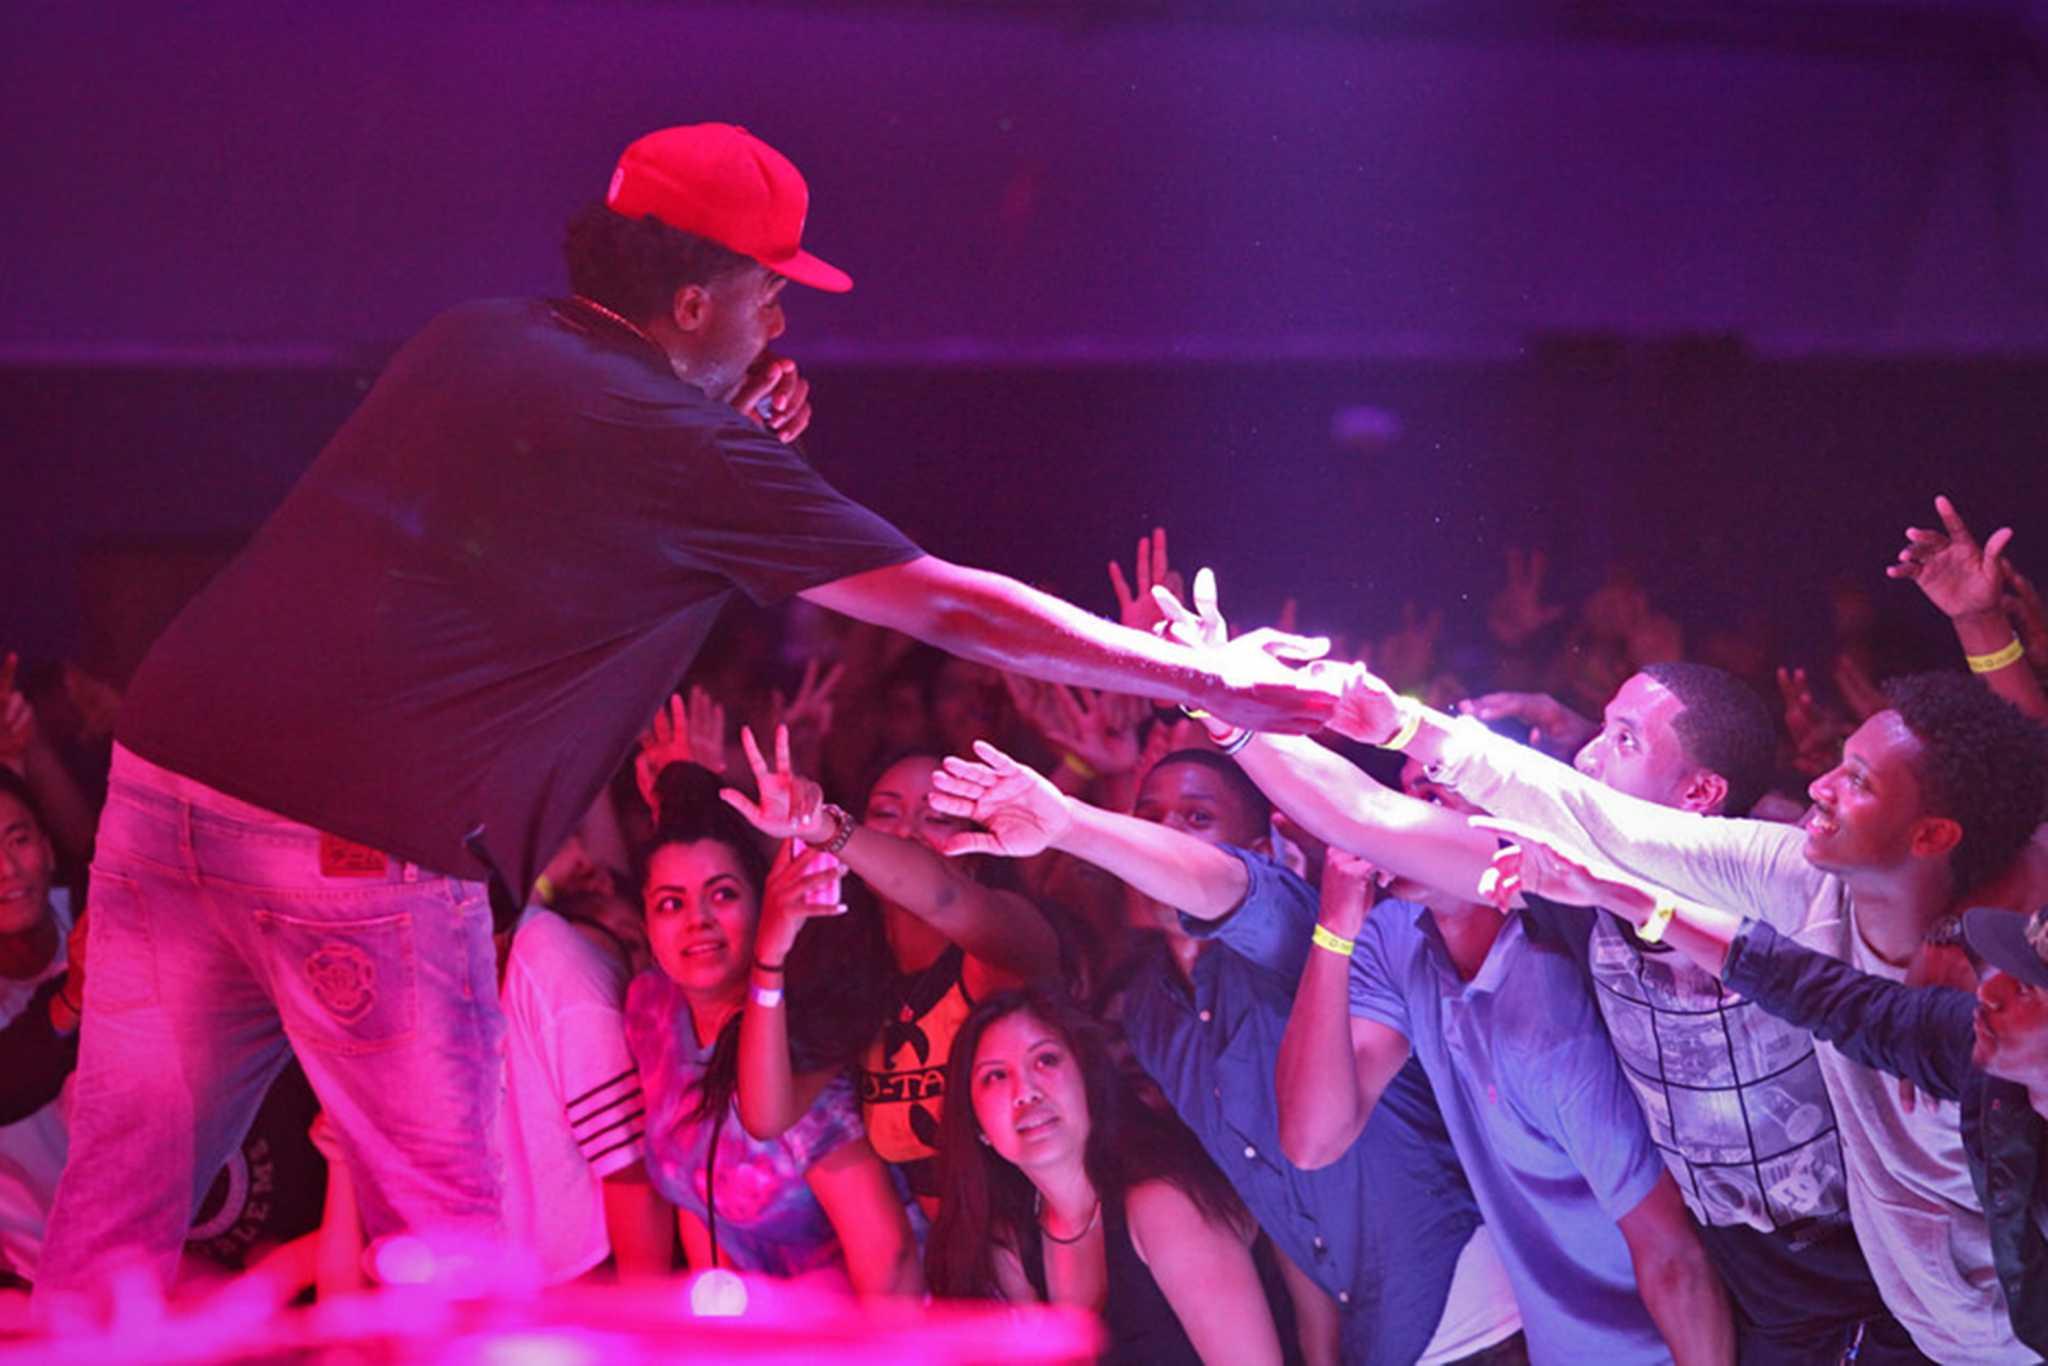 Bay Area rapper Iamsu! performance a step in shaking off 'commuter school' label